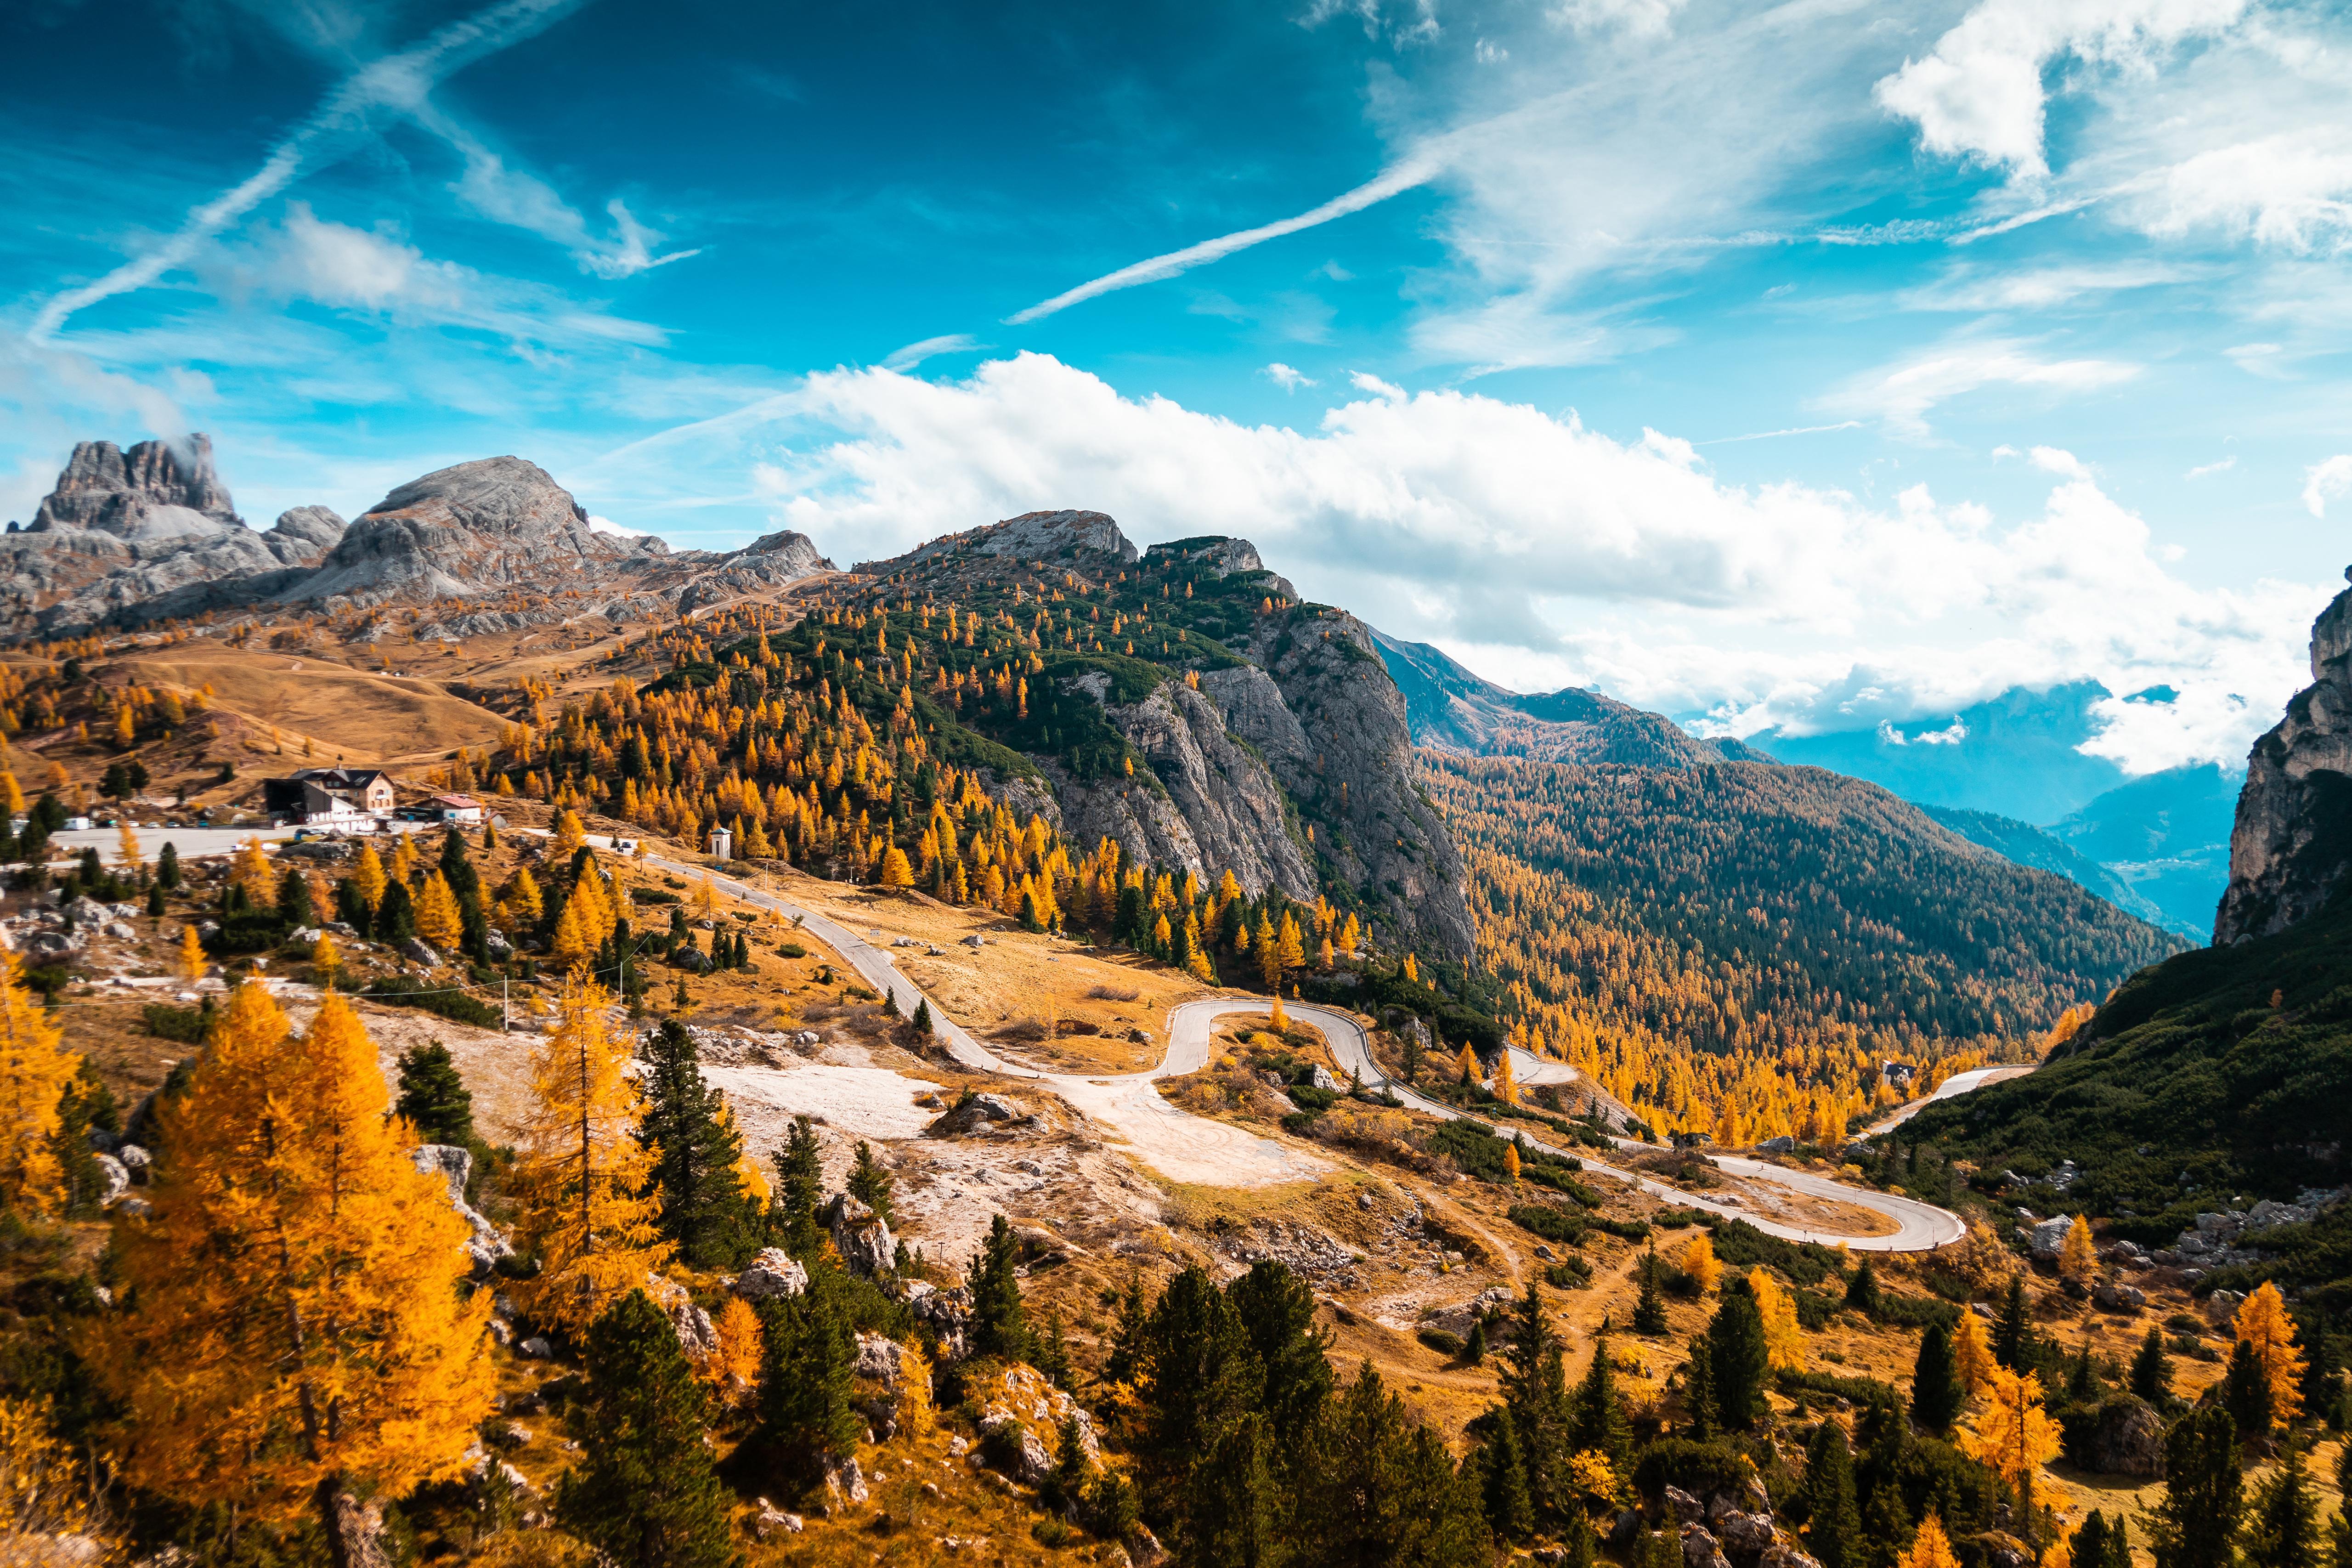 italy autumn forest 4k 1615197512 - Italy Autumn Forest 4k - Italy Autumn Forest 4k wallpapers